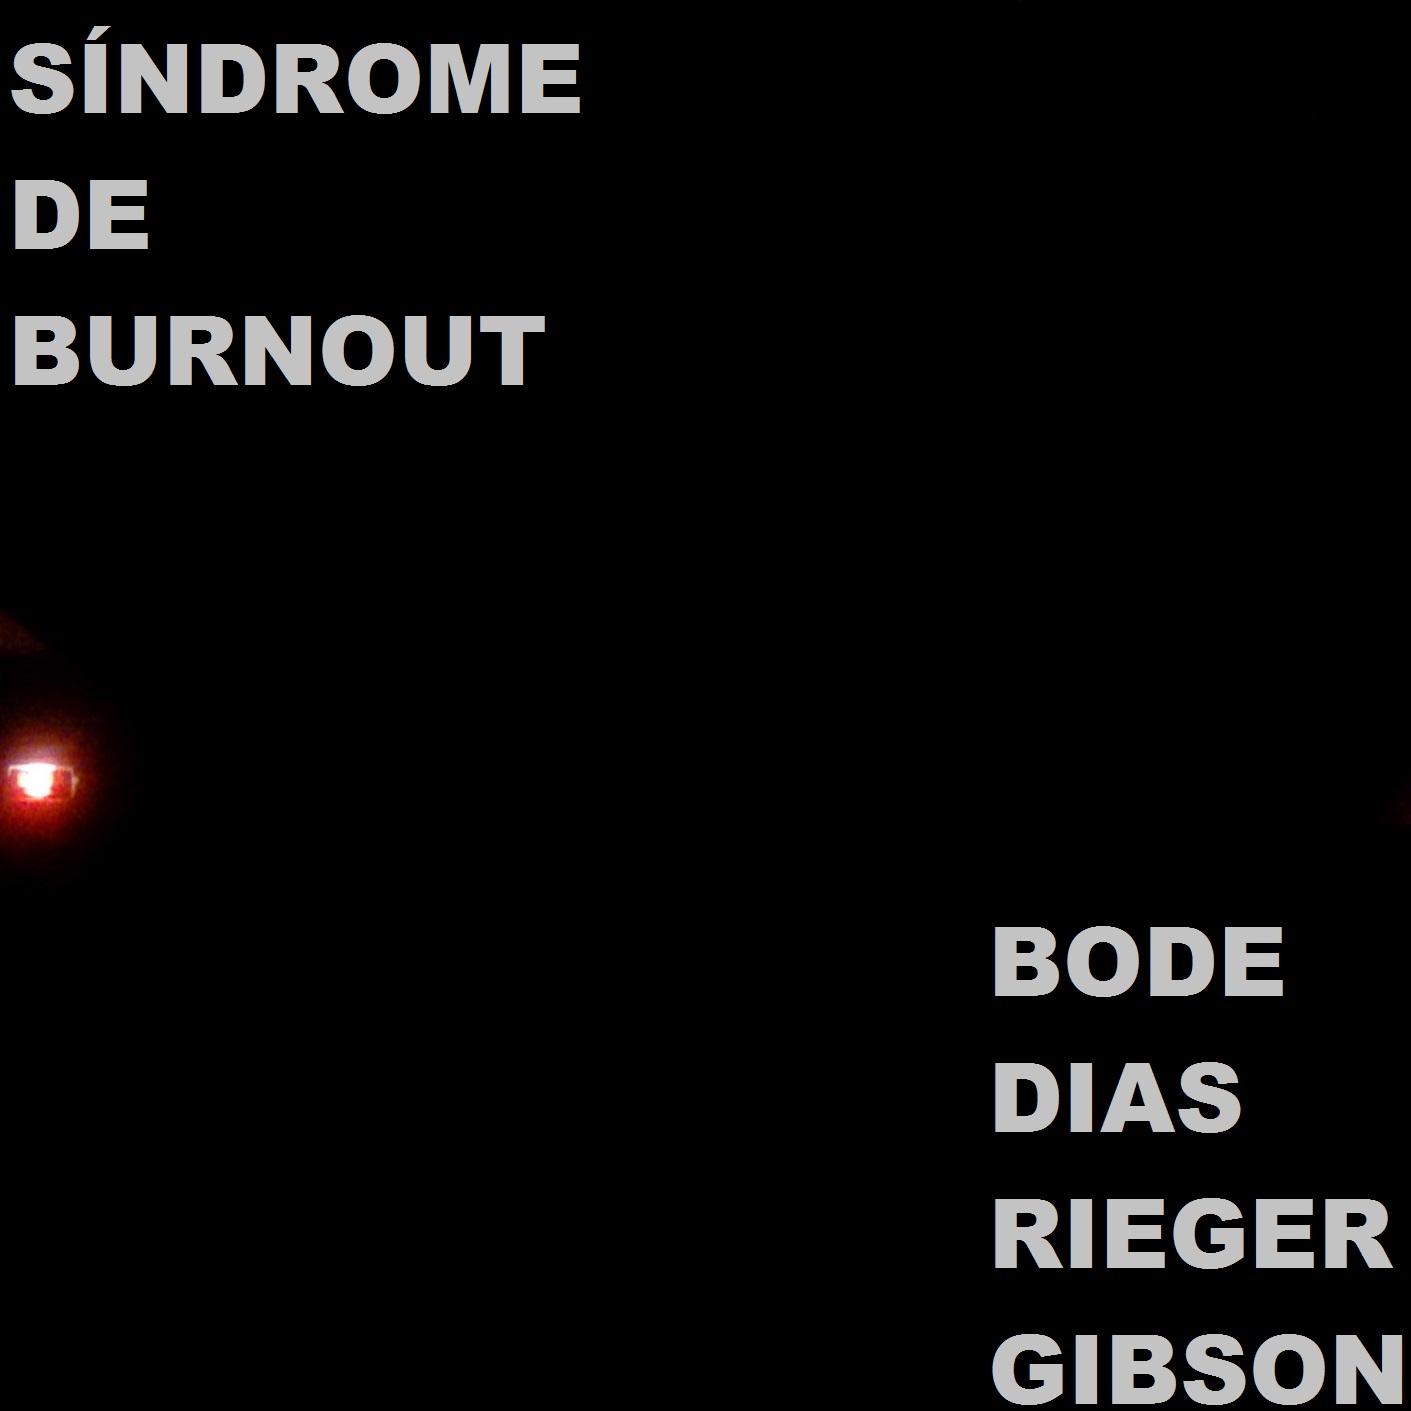 MSRCD046 - Bode, Dias, Rieger, Gibson - Síndrome de Burnout